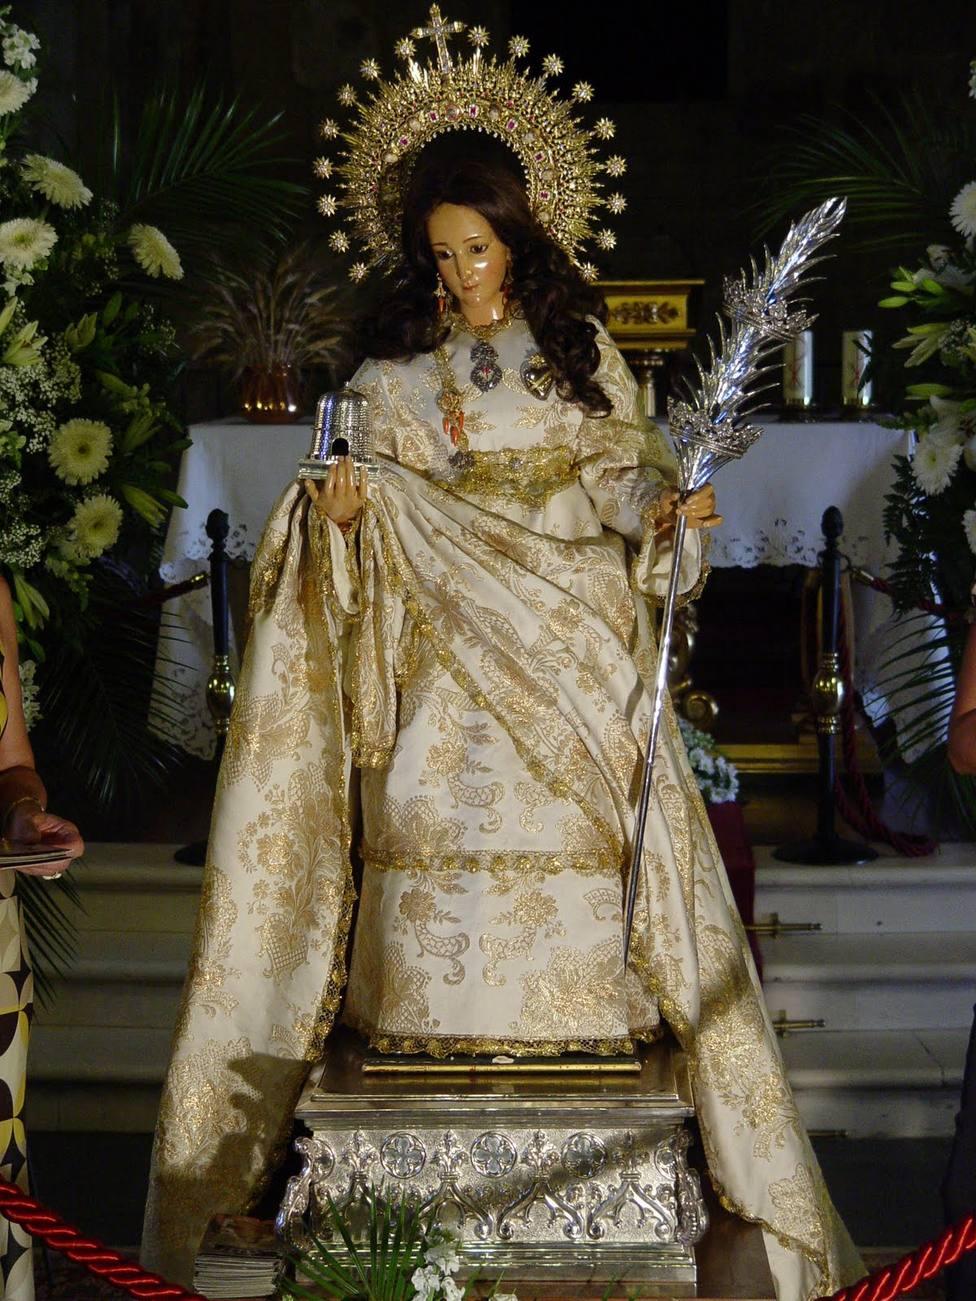 Mártir Santa Eulalia, patrona de Mérida. Foto: Archivo